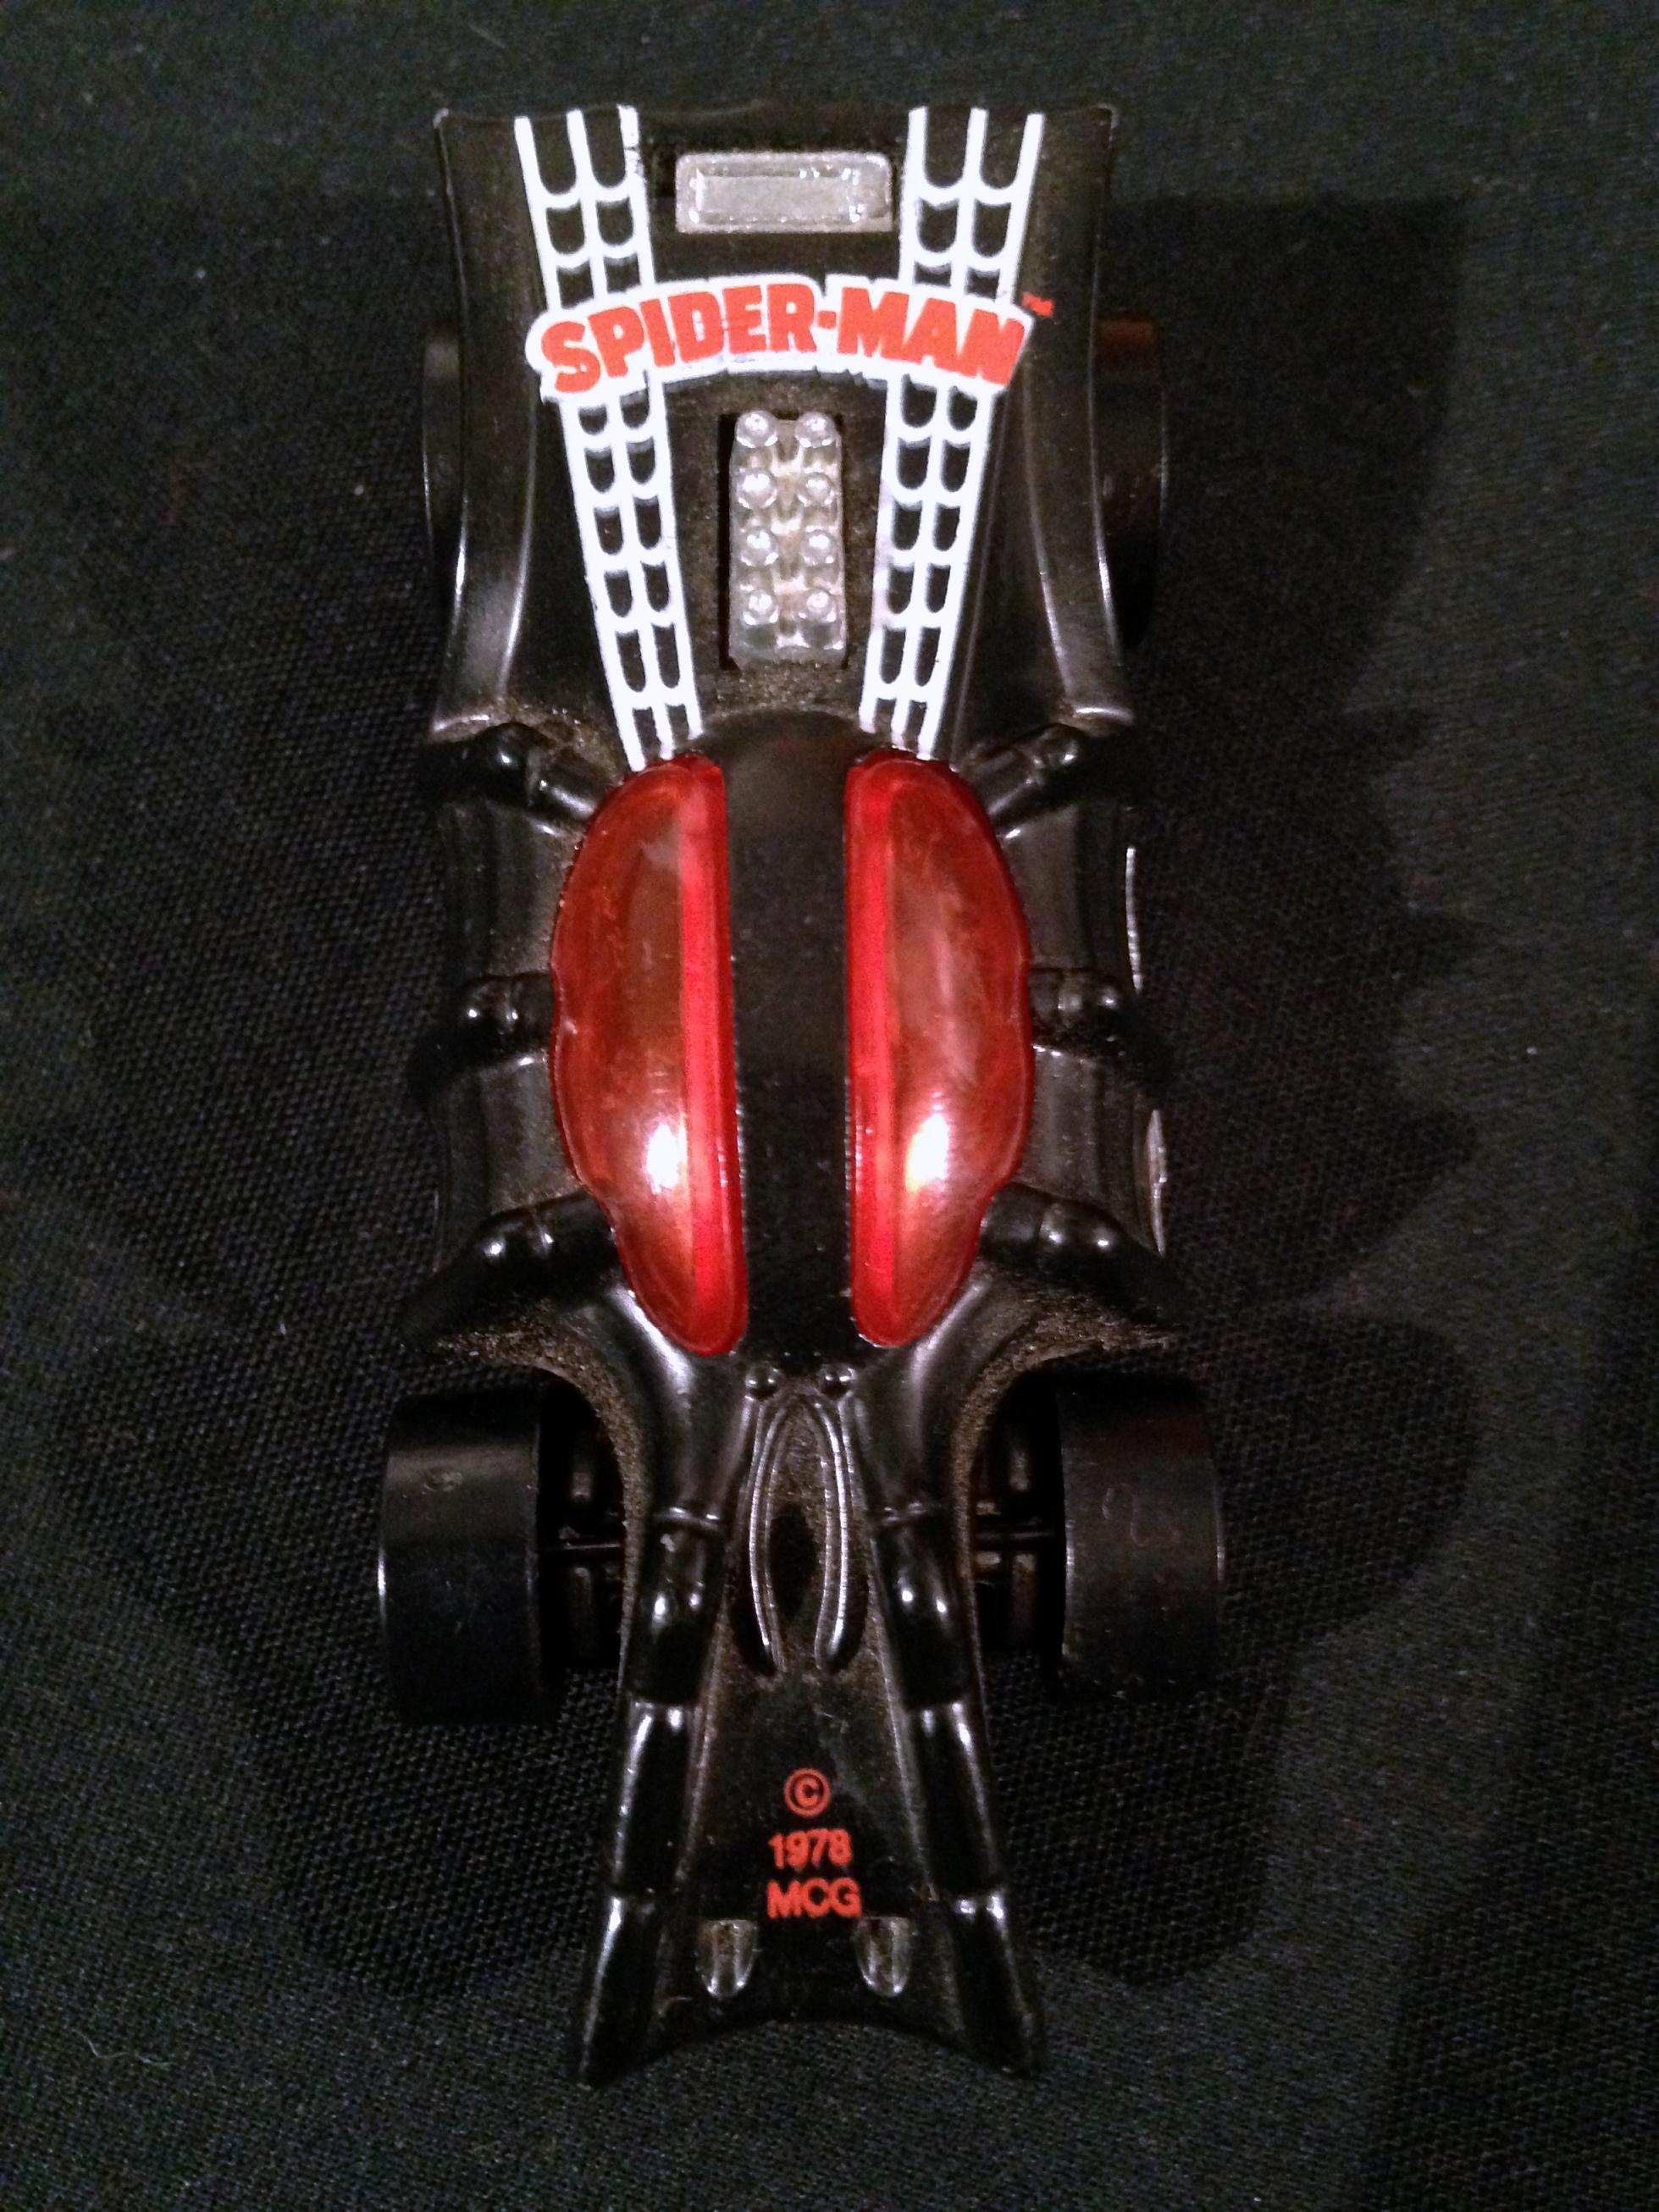 Hot Wheels Spider-car 1978 (2)